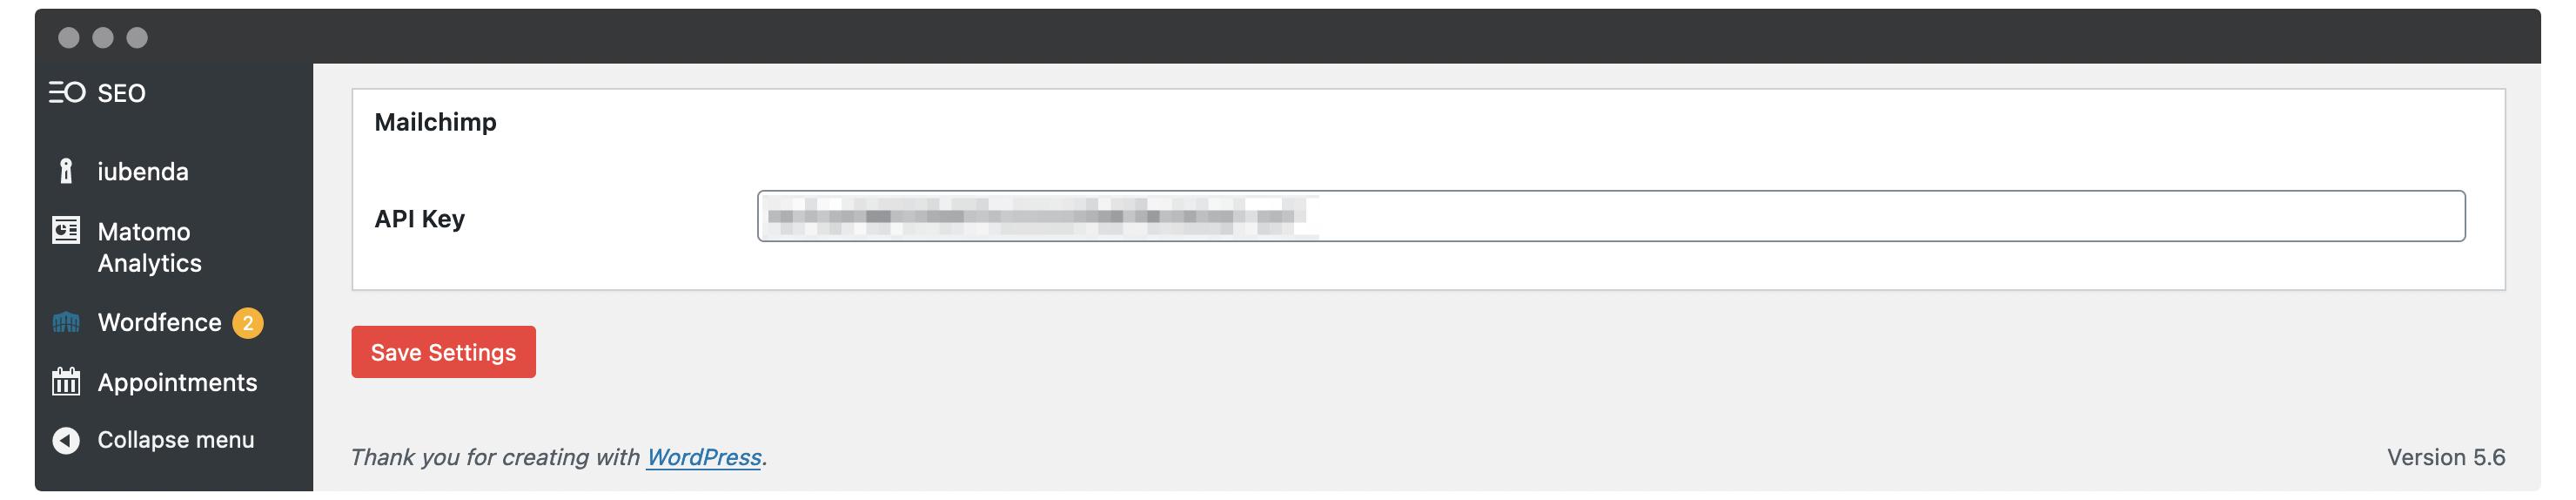 Adding an API key within WordPress.